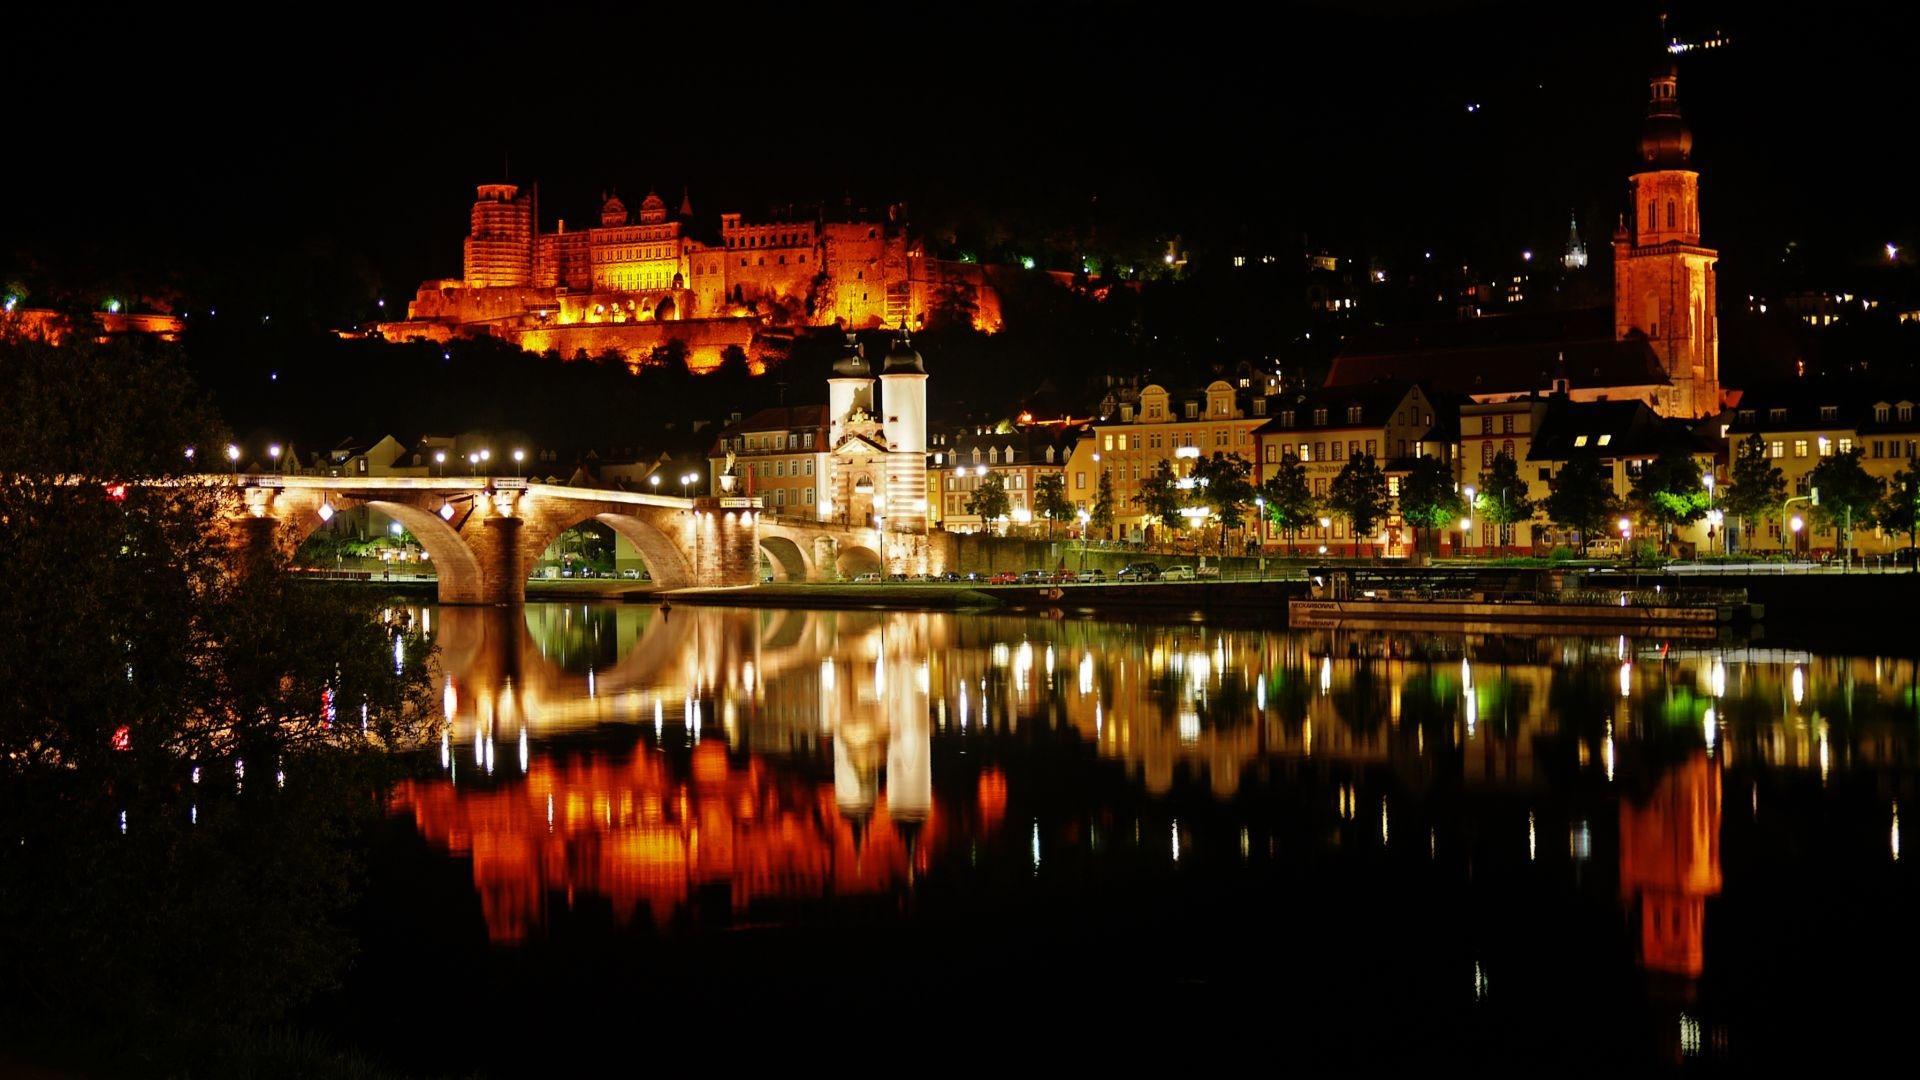 Heidelberg Castle wallpapers HD quality